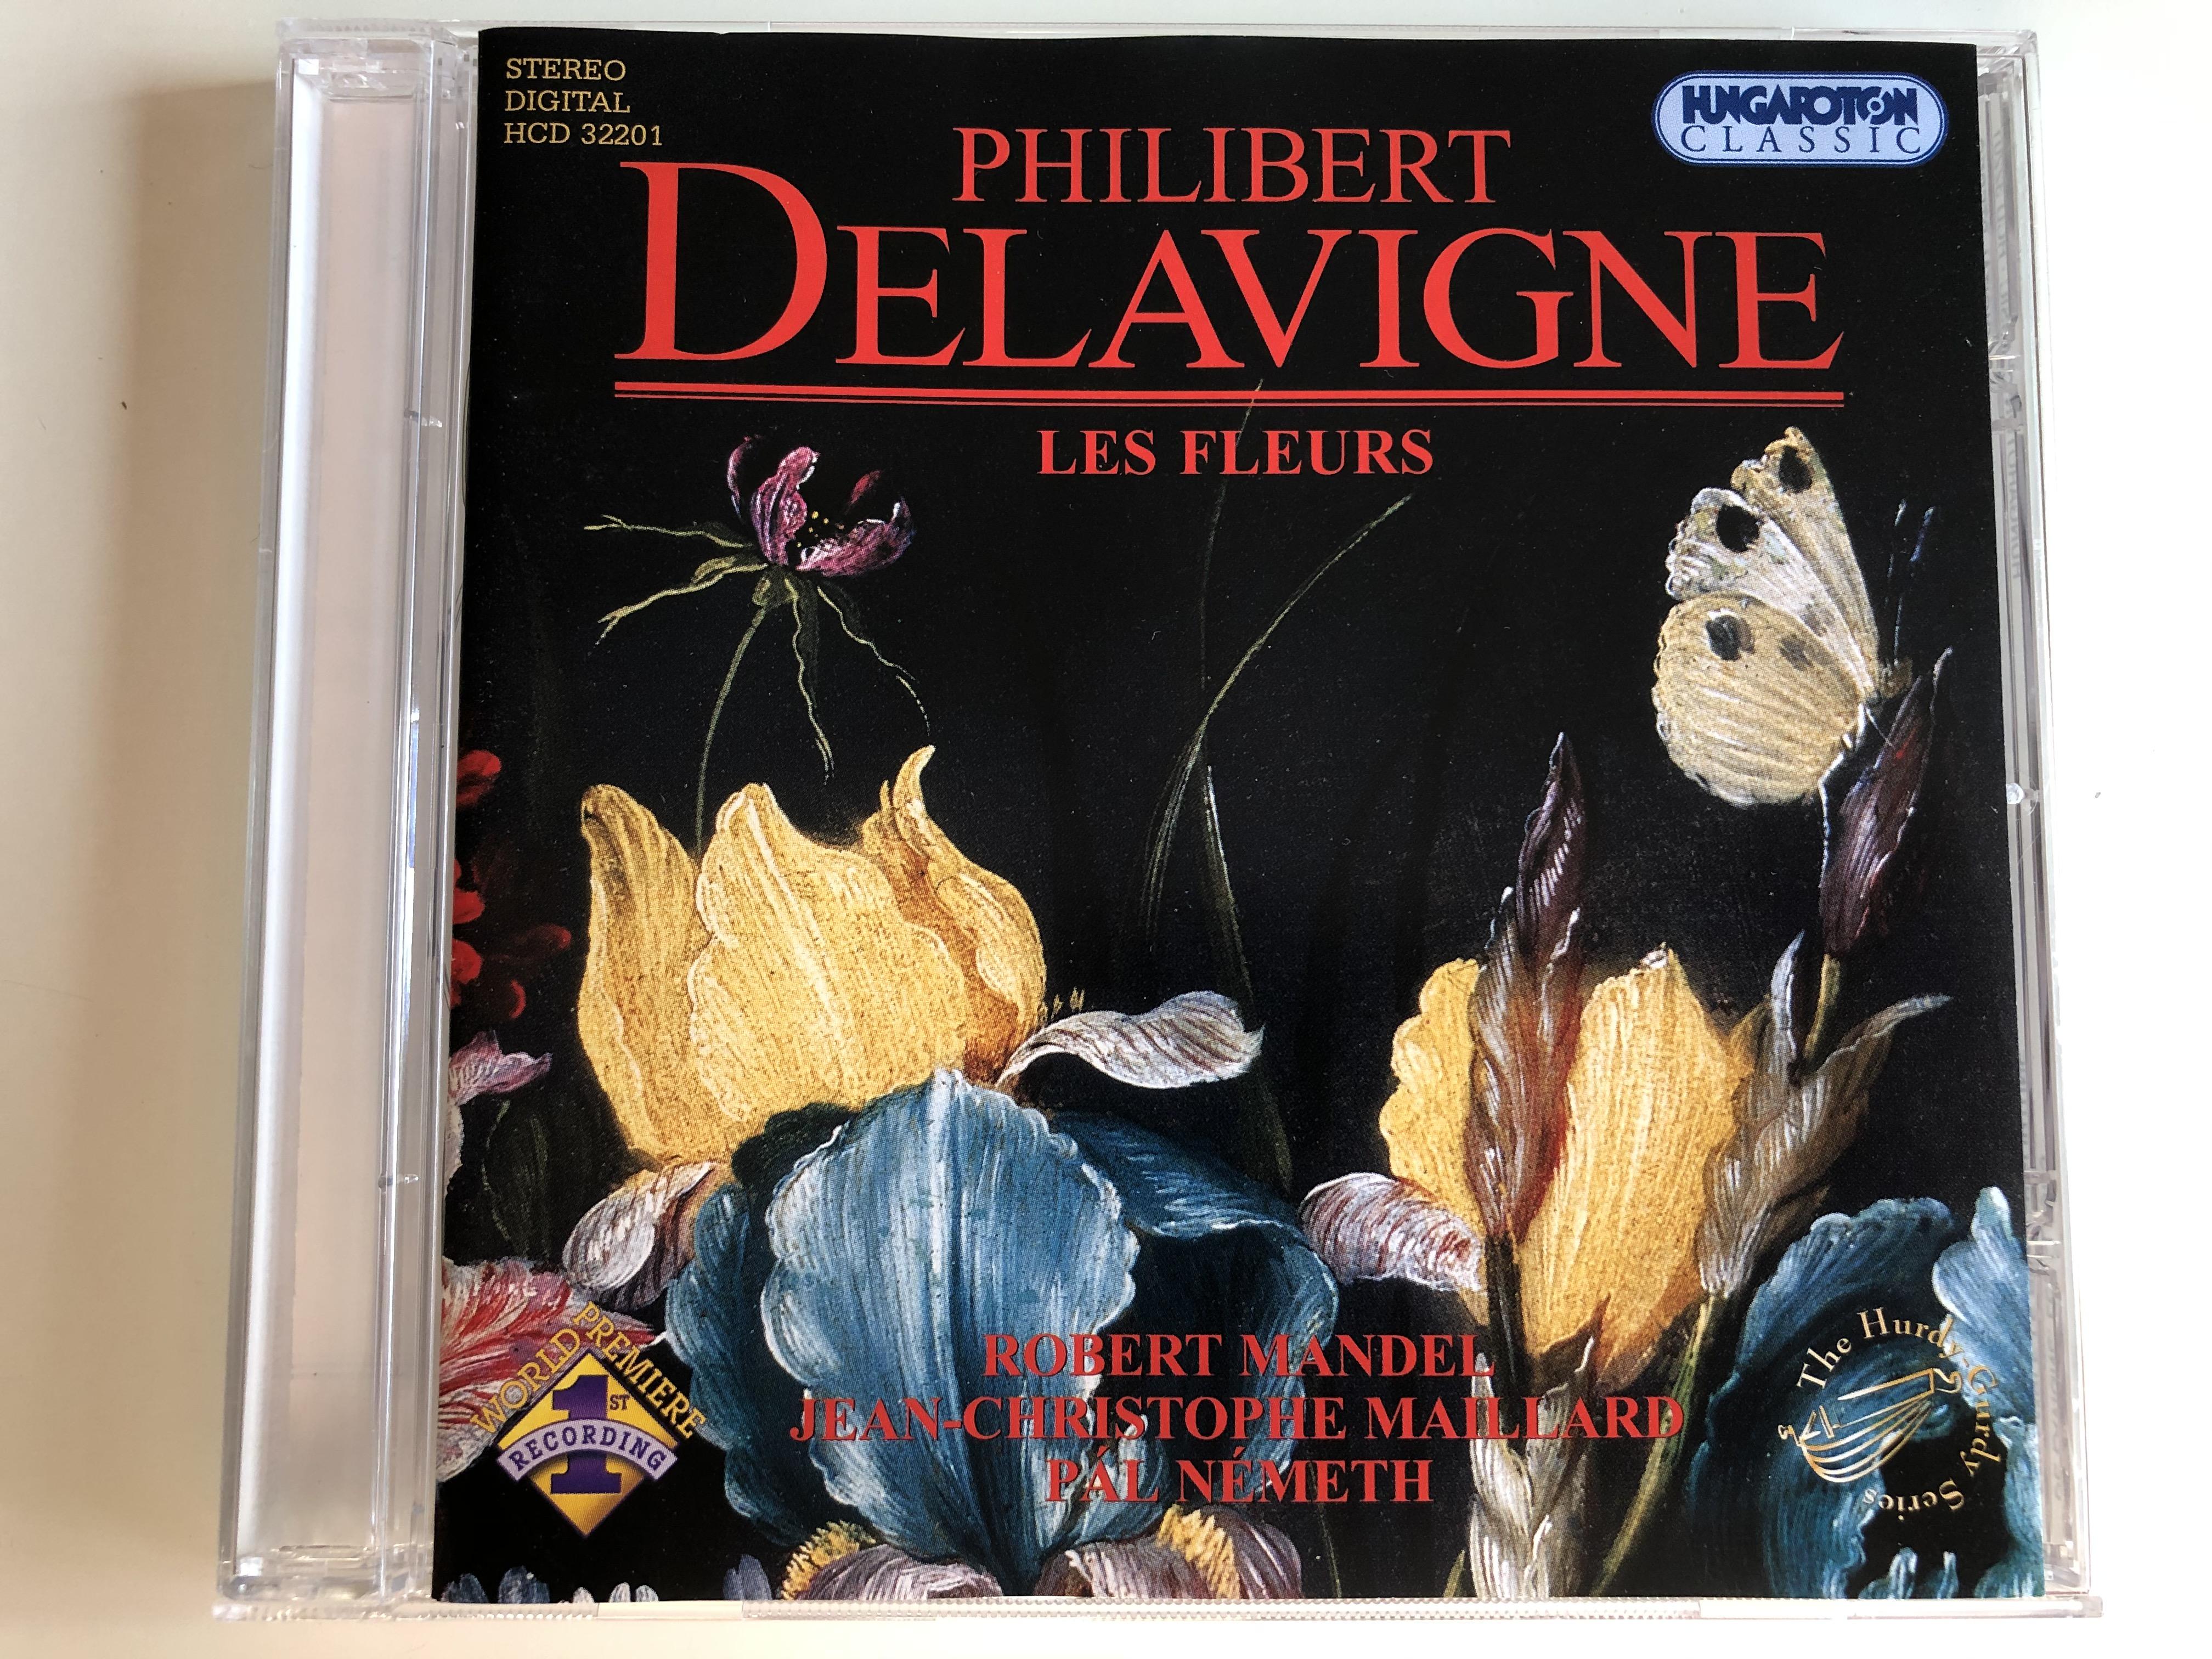 philibert-delavigne-les-fleurs-robert-mandel-jean-christophe-maillard-pal-nemeth-hungaroton-classic-audio-cd-2005-stereo-hcd-32201-1-.jpg